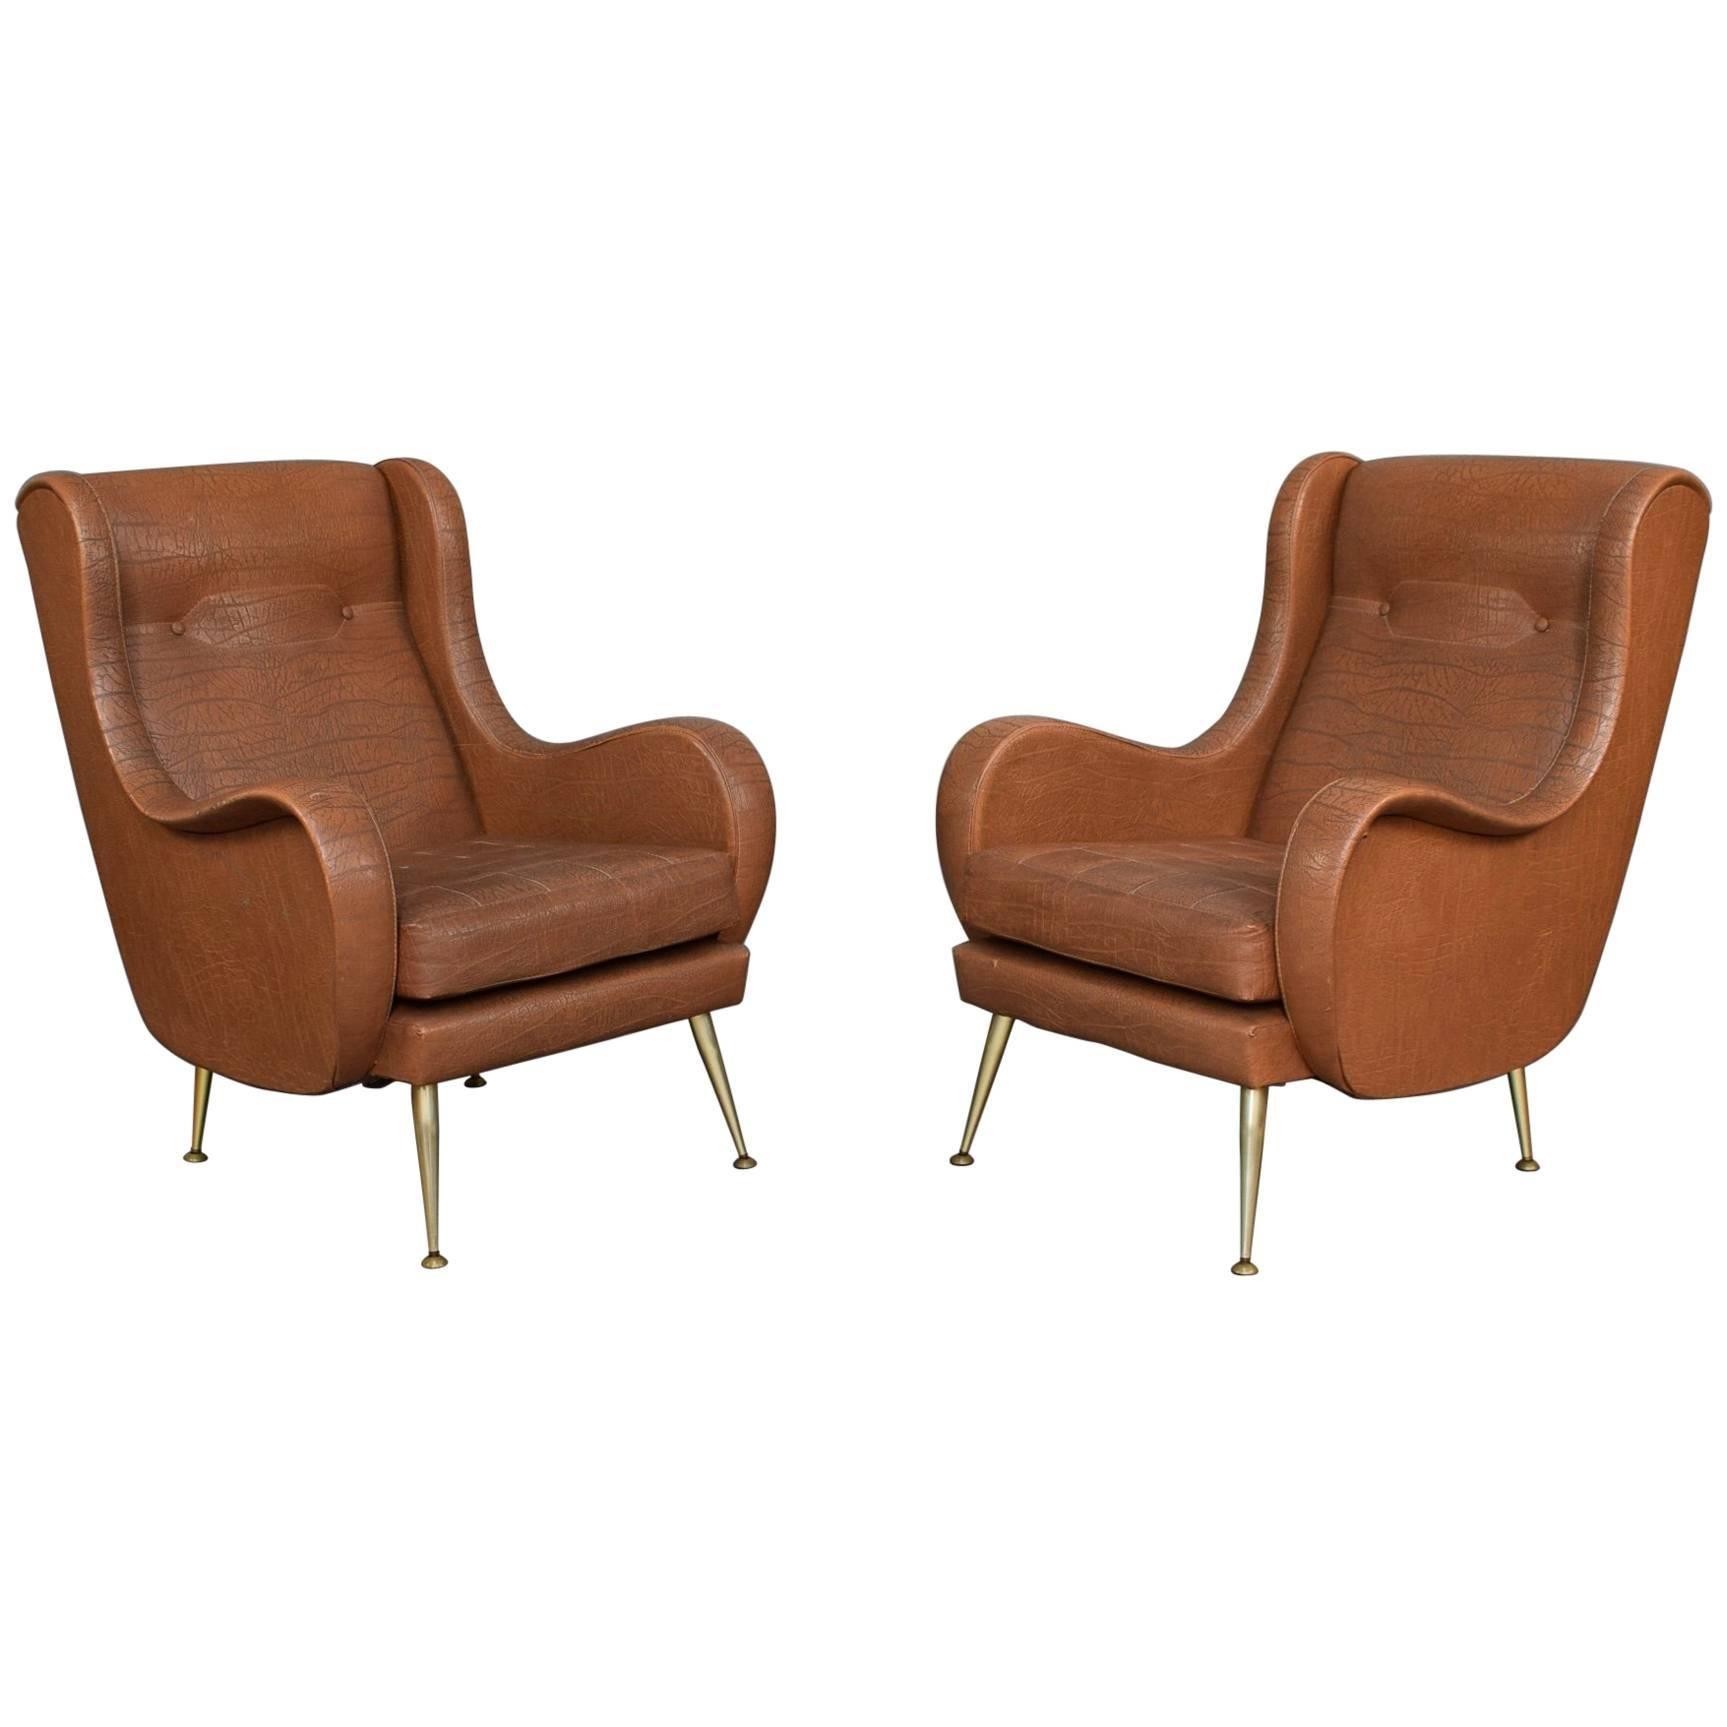 Pair of Italian Aldo Morbelli Lounge Armchairs, 1950s